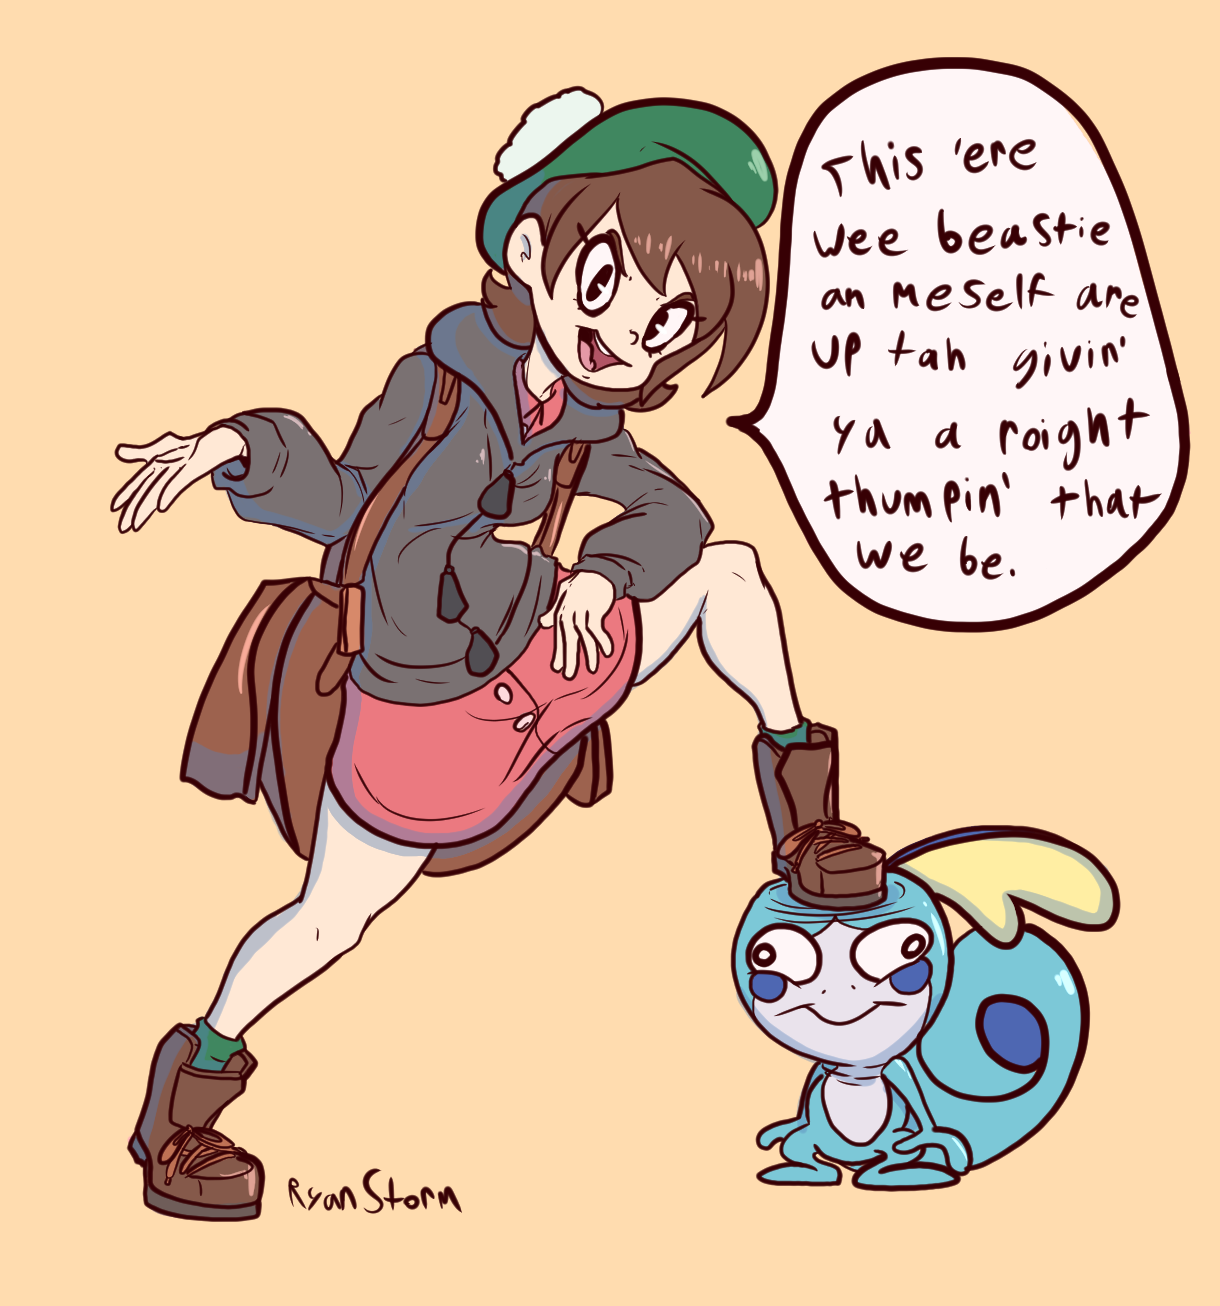 Pokemon Trainer and Her Wee Beastie